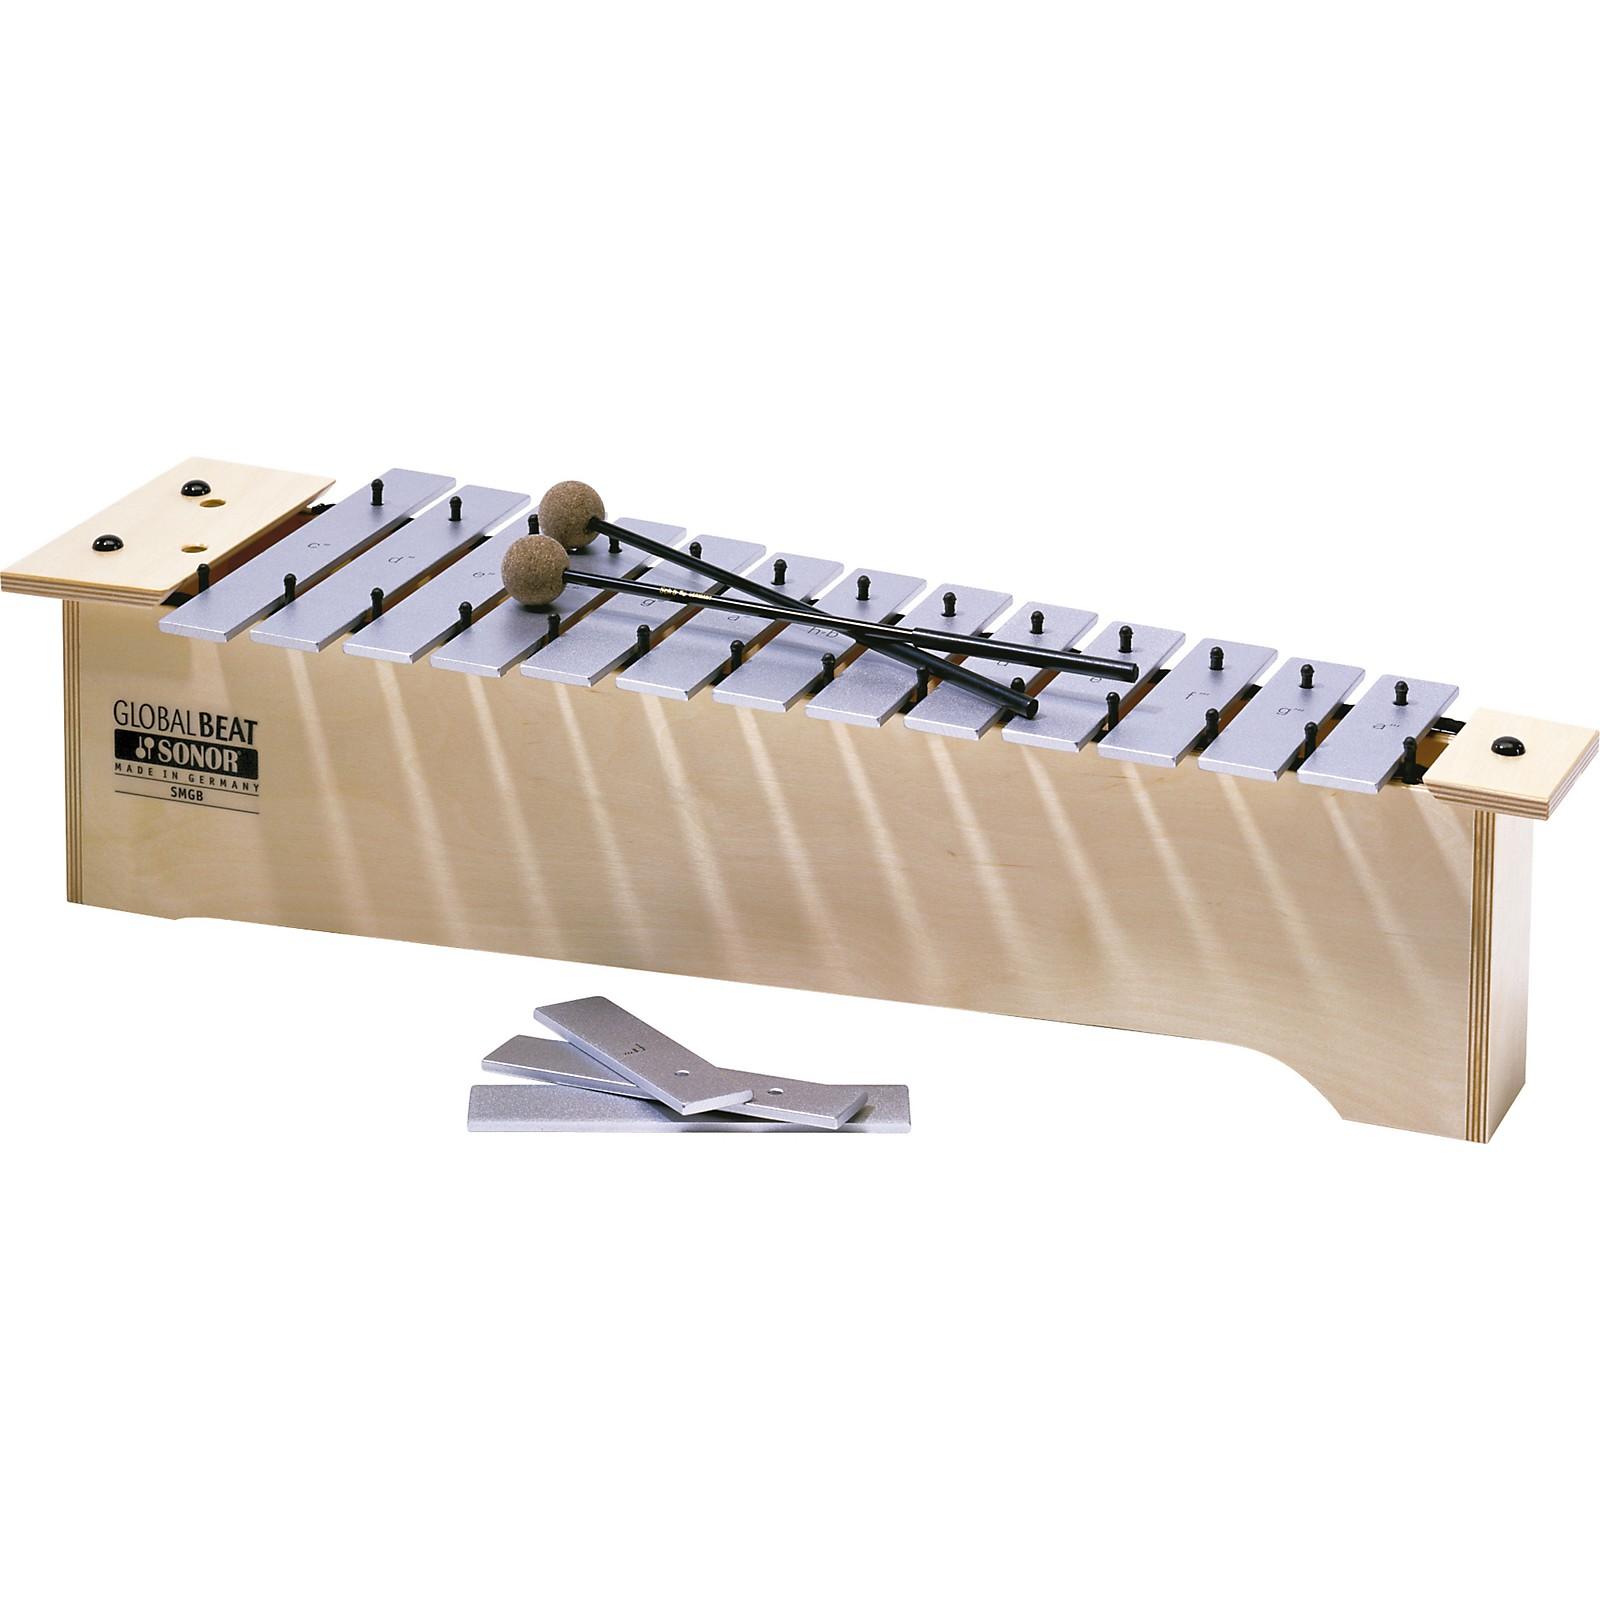 Sonor Orff Global Beat Soprano Metallophone